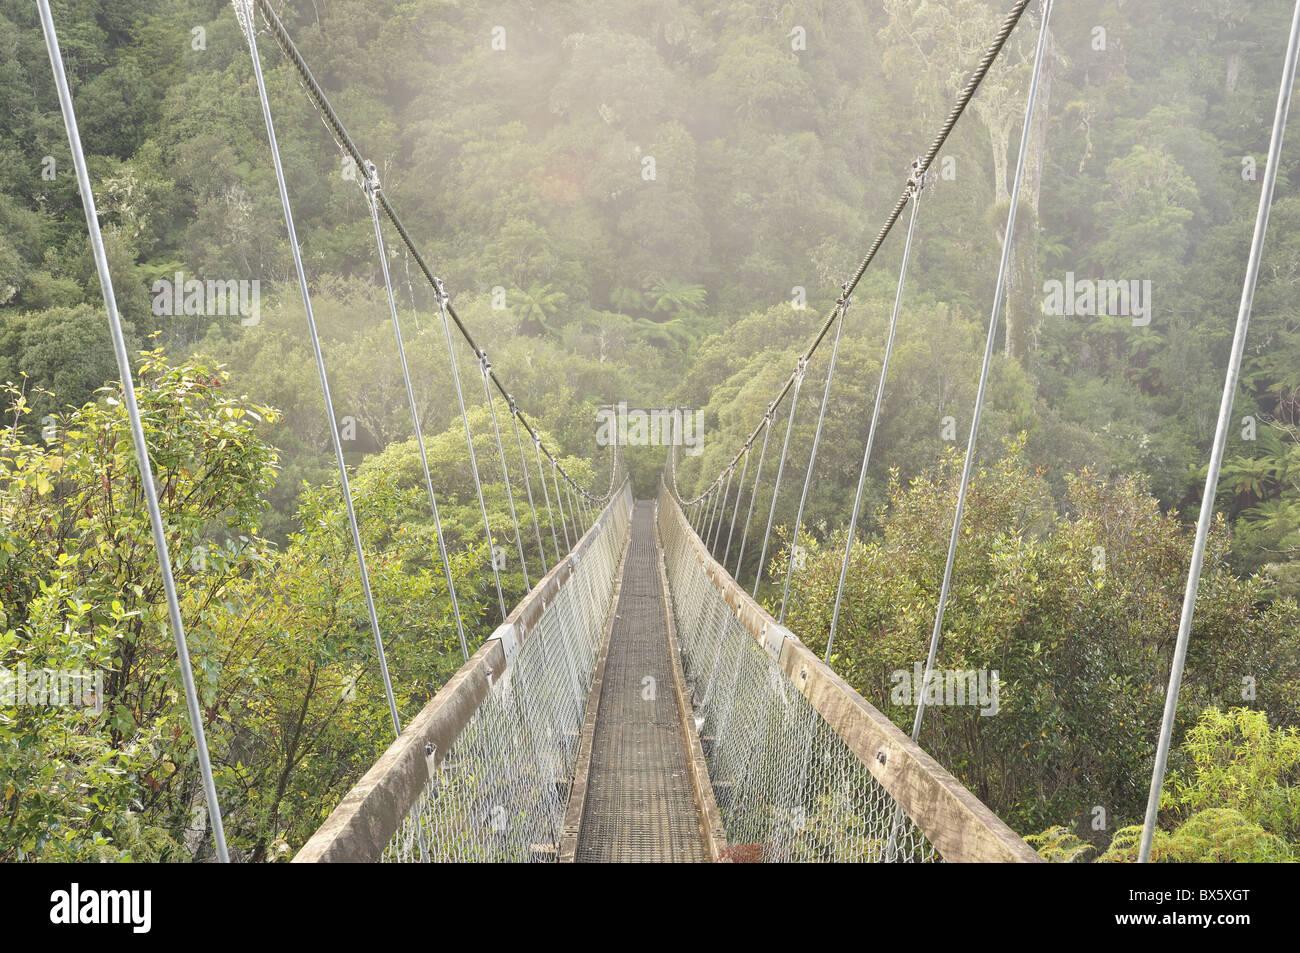 Swingbridge, Motu Falls, Motu, Gisborne, North Island, New Zealand, Pacific - Stock Image